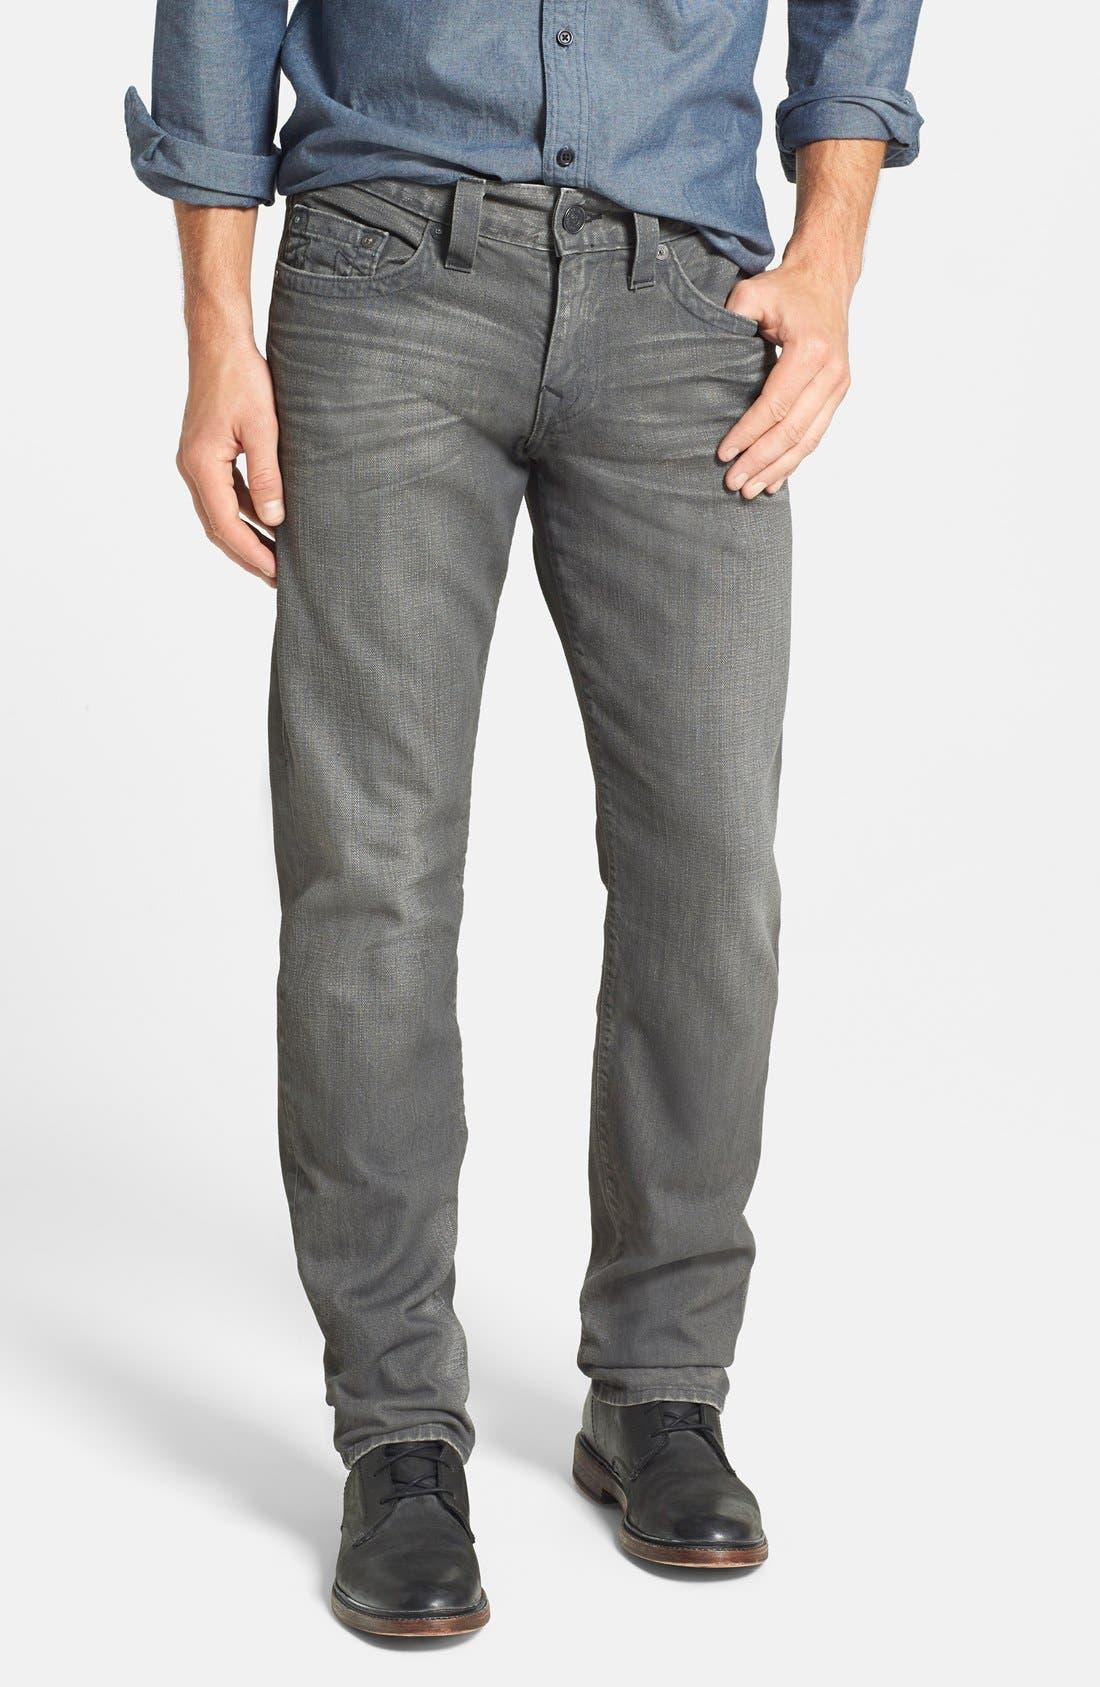 Alternate Image 1 Selected - True Religion Brand Jeans 'Geno' Straight Leg Jeans (Concrete Hill)